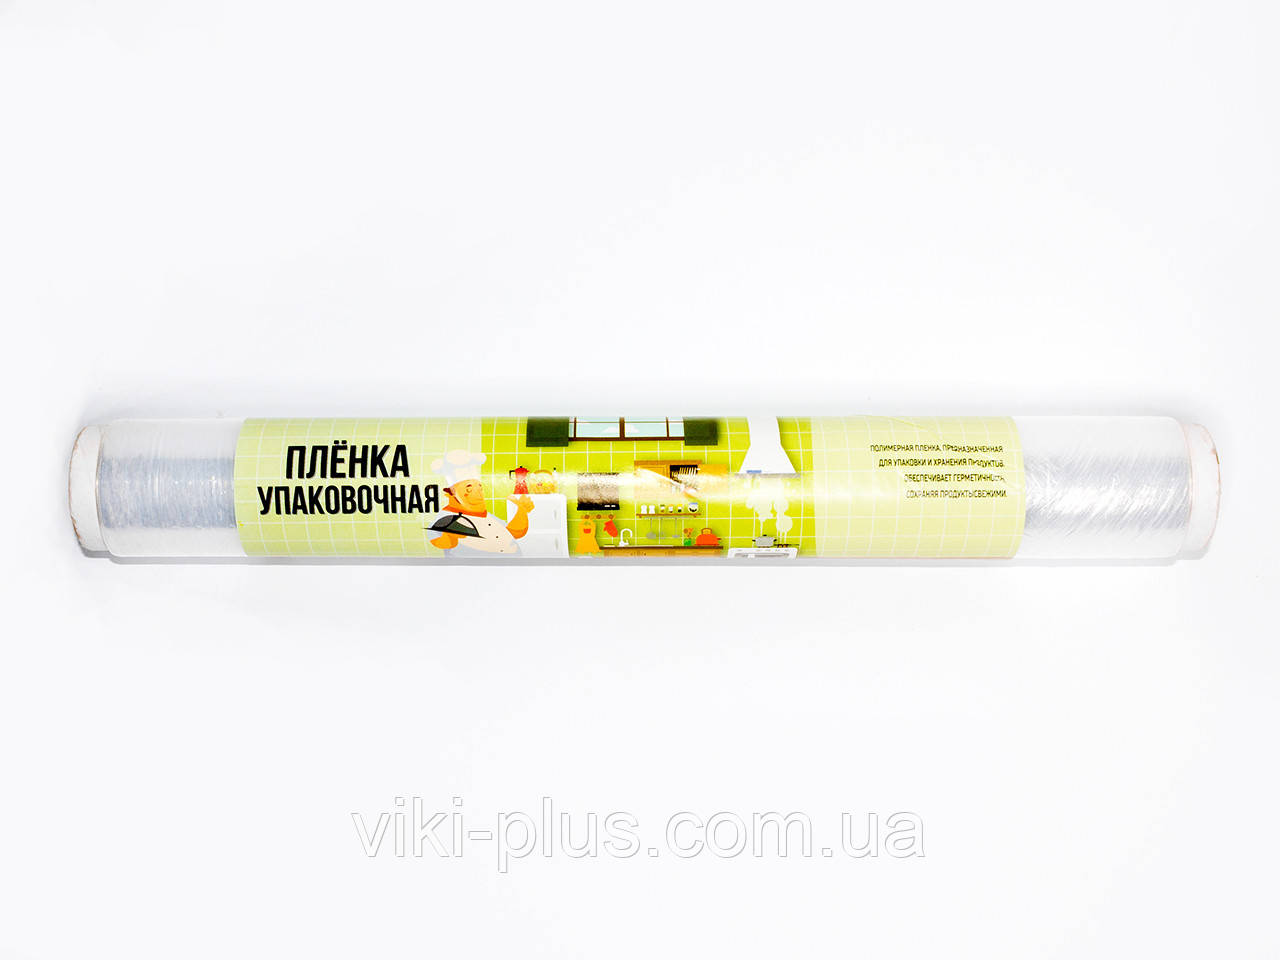 Пленка П/E/300мм/45м/в упаковке